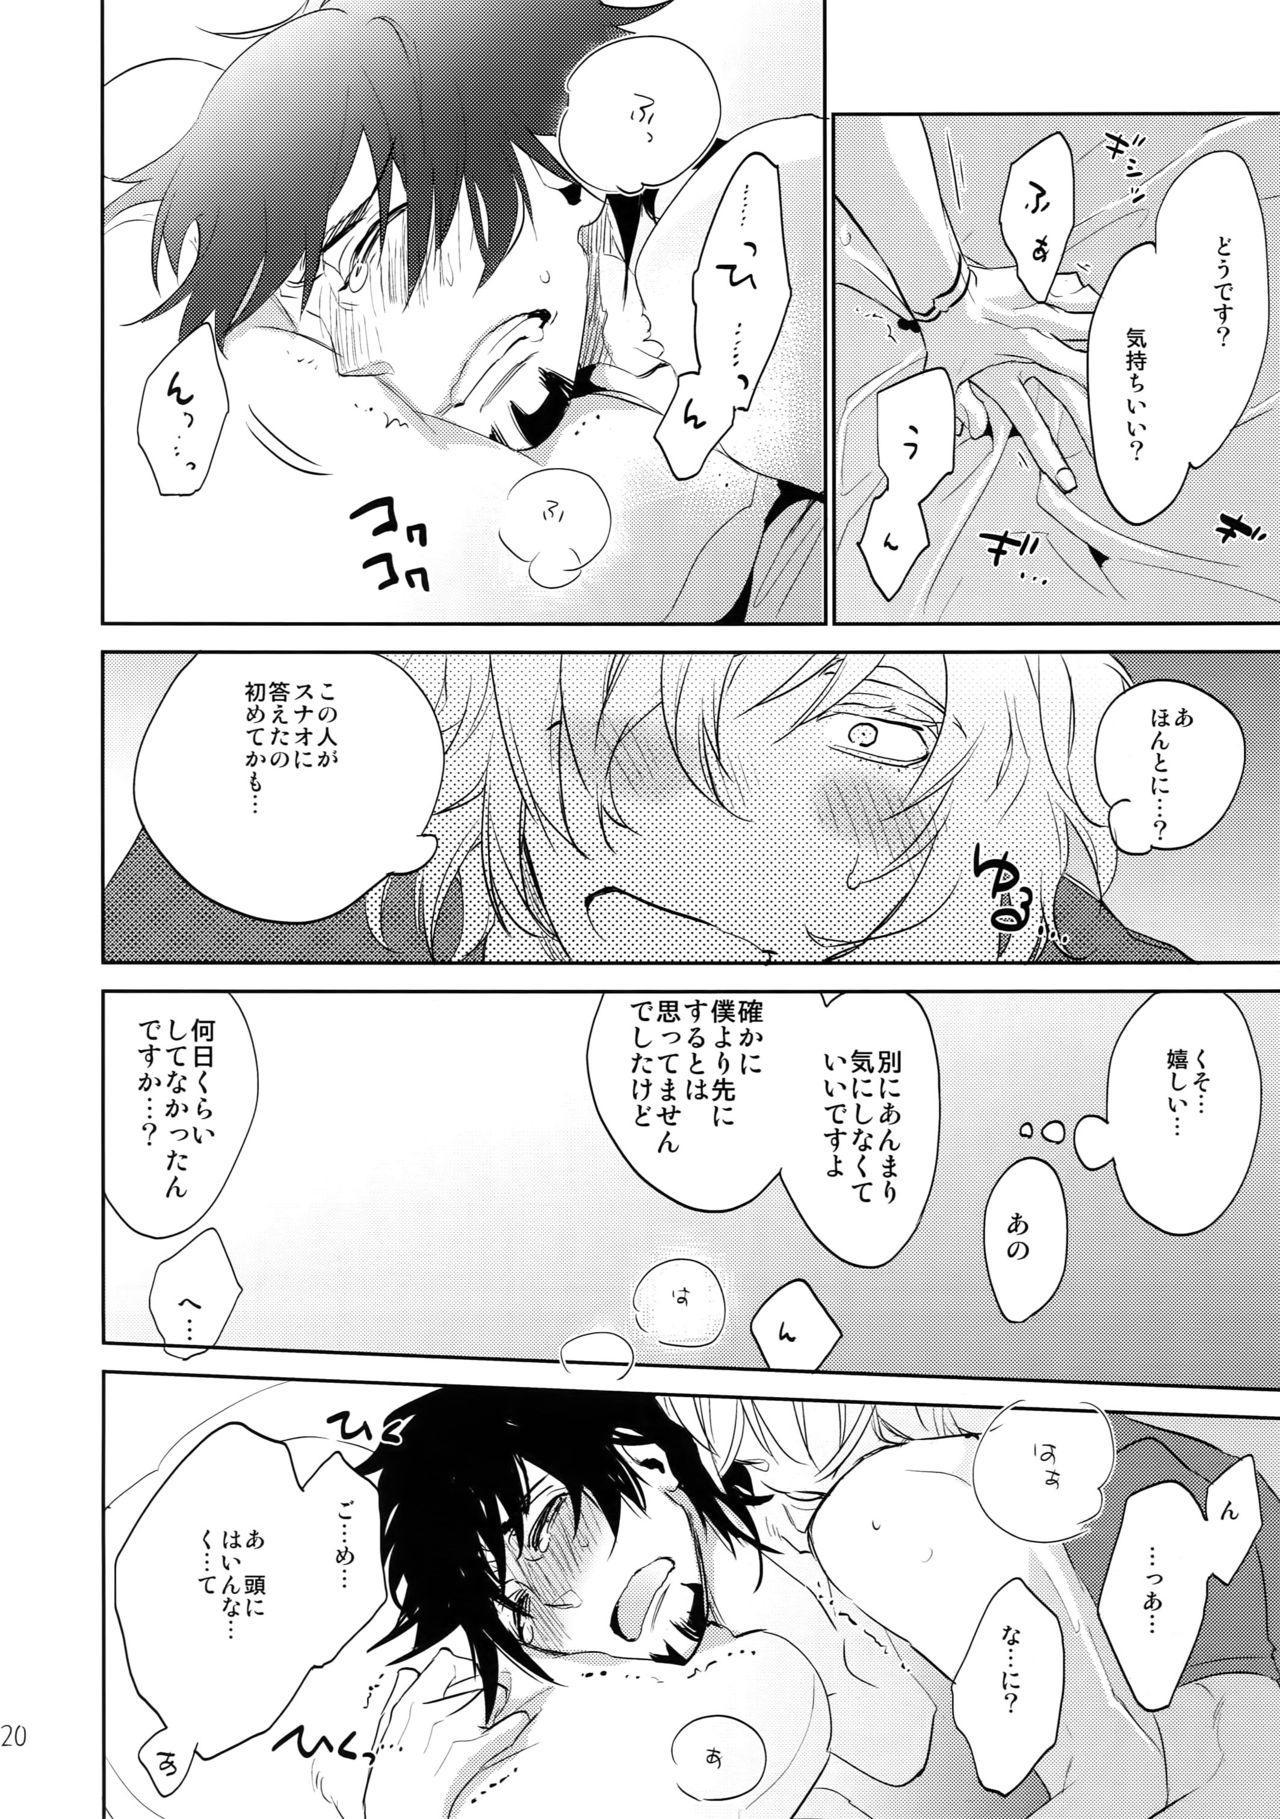 T&B Sairoku! 2 18